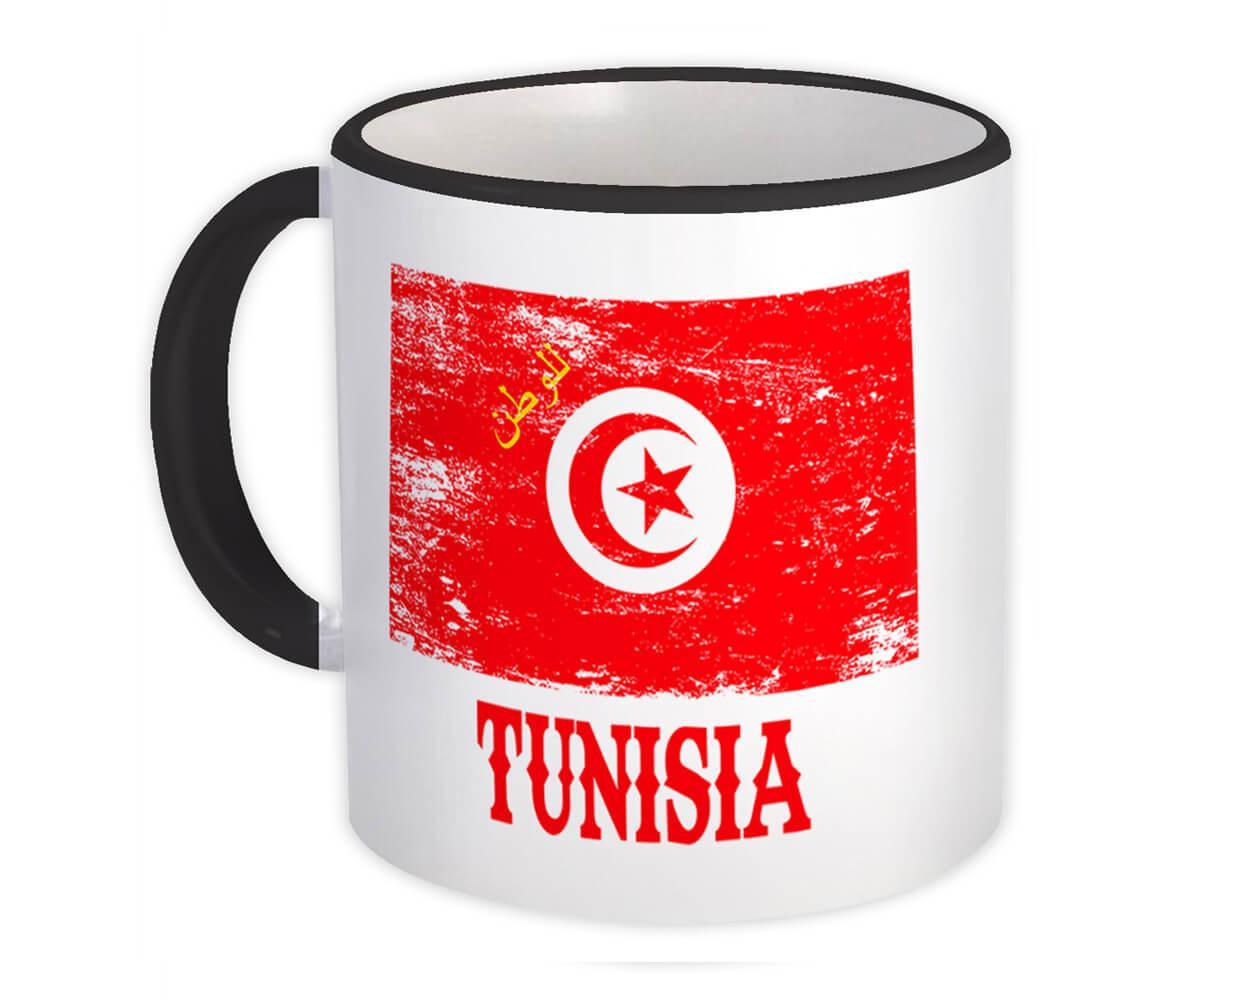 Tunisia : Gift Mug Distressed Flag Patriotic Tunisian Expat Country